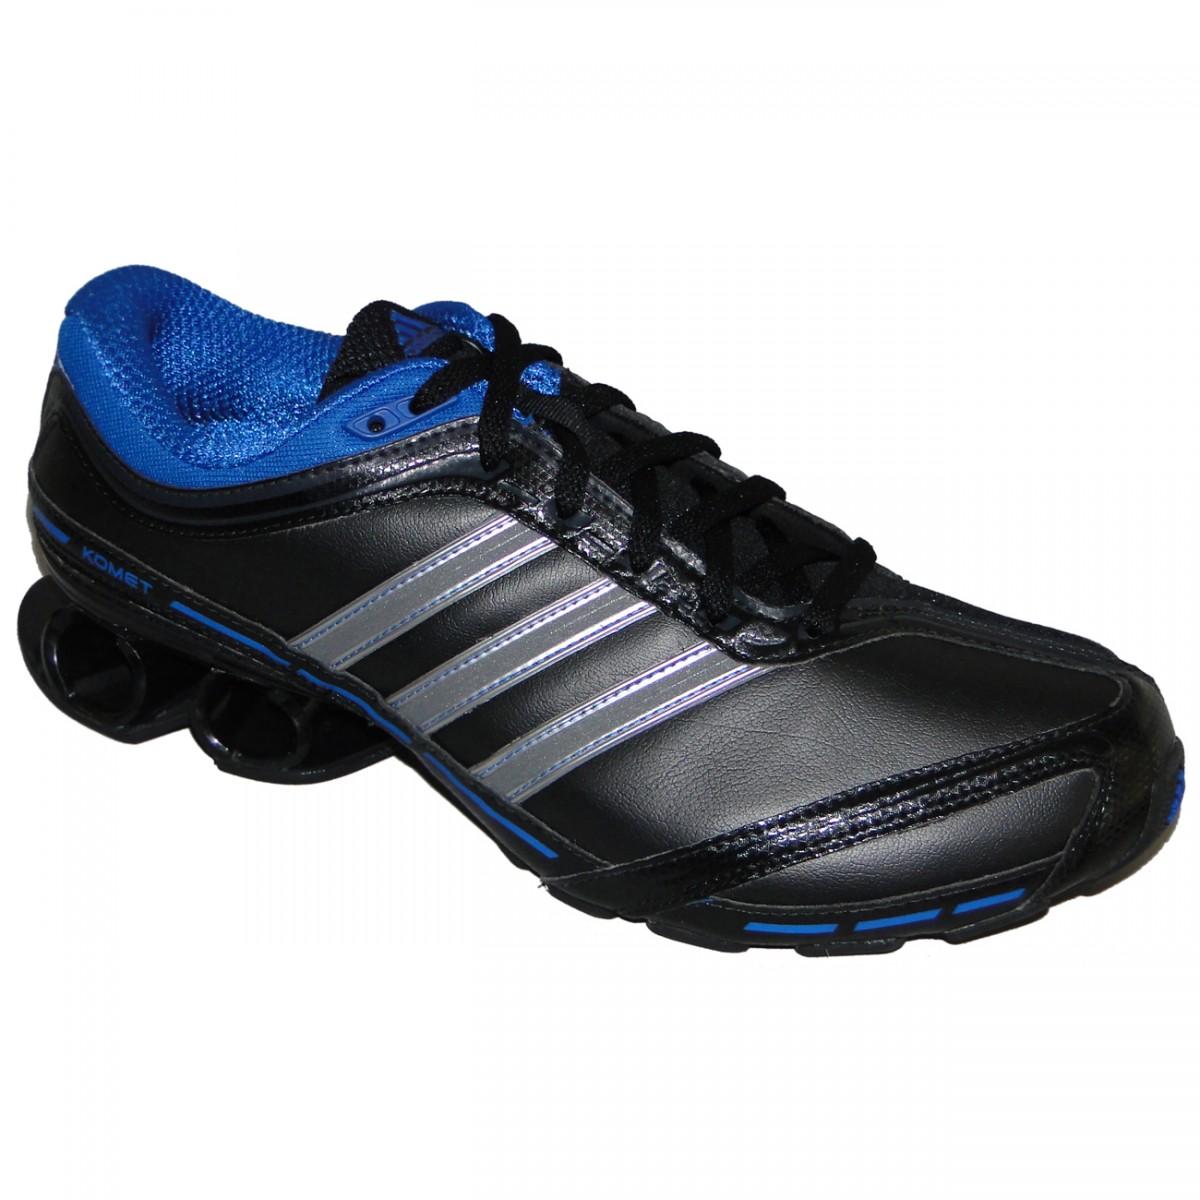 Tênis Adidas Komet M 7719 - PRETO PRATA AZUL - Chuteira Nike ee6526cd40e41